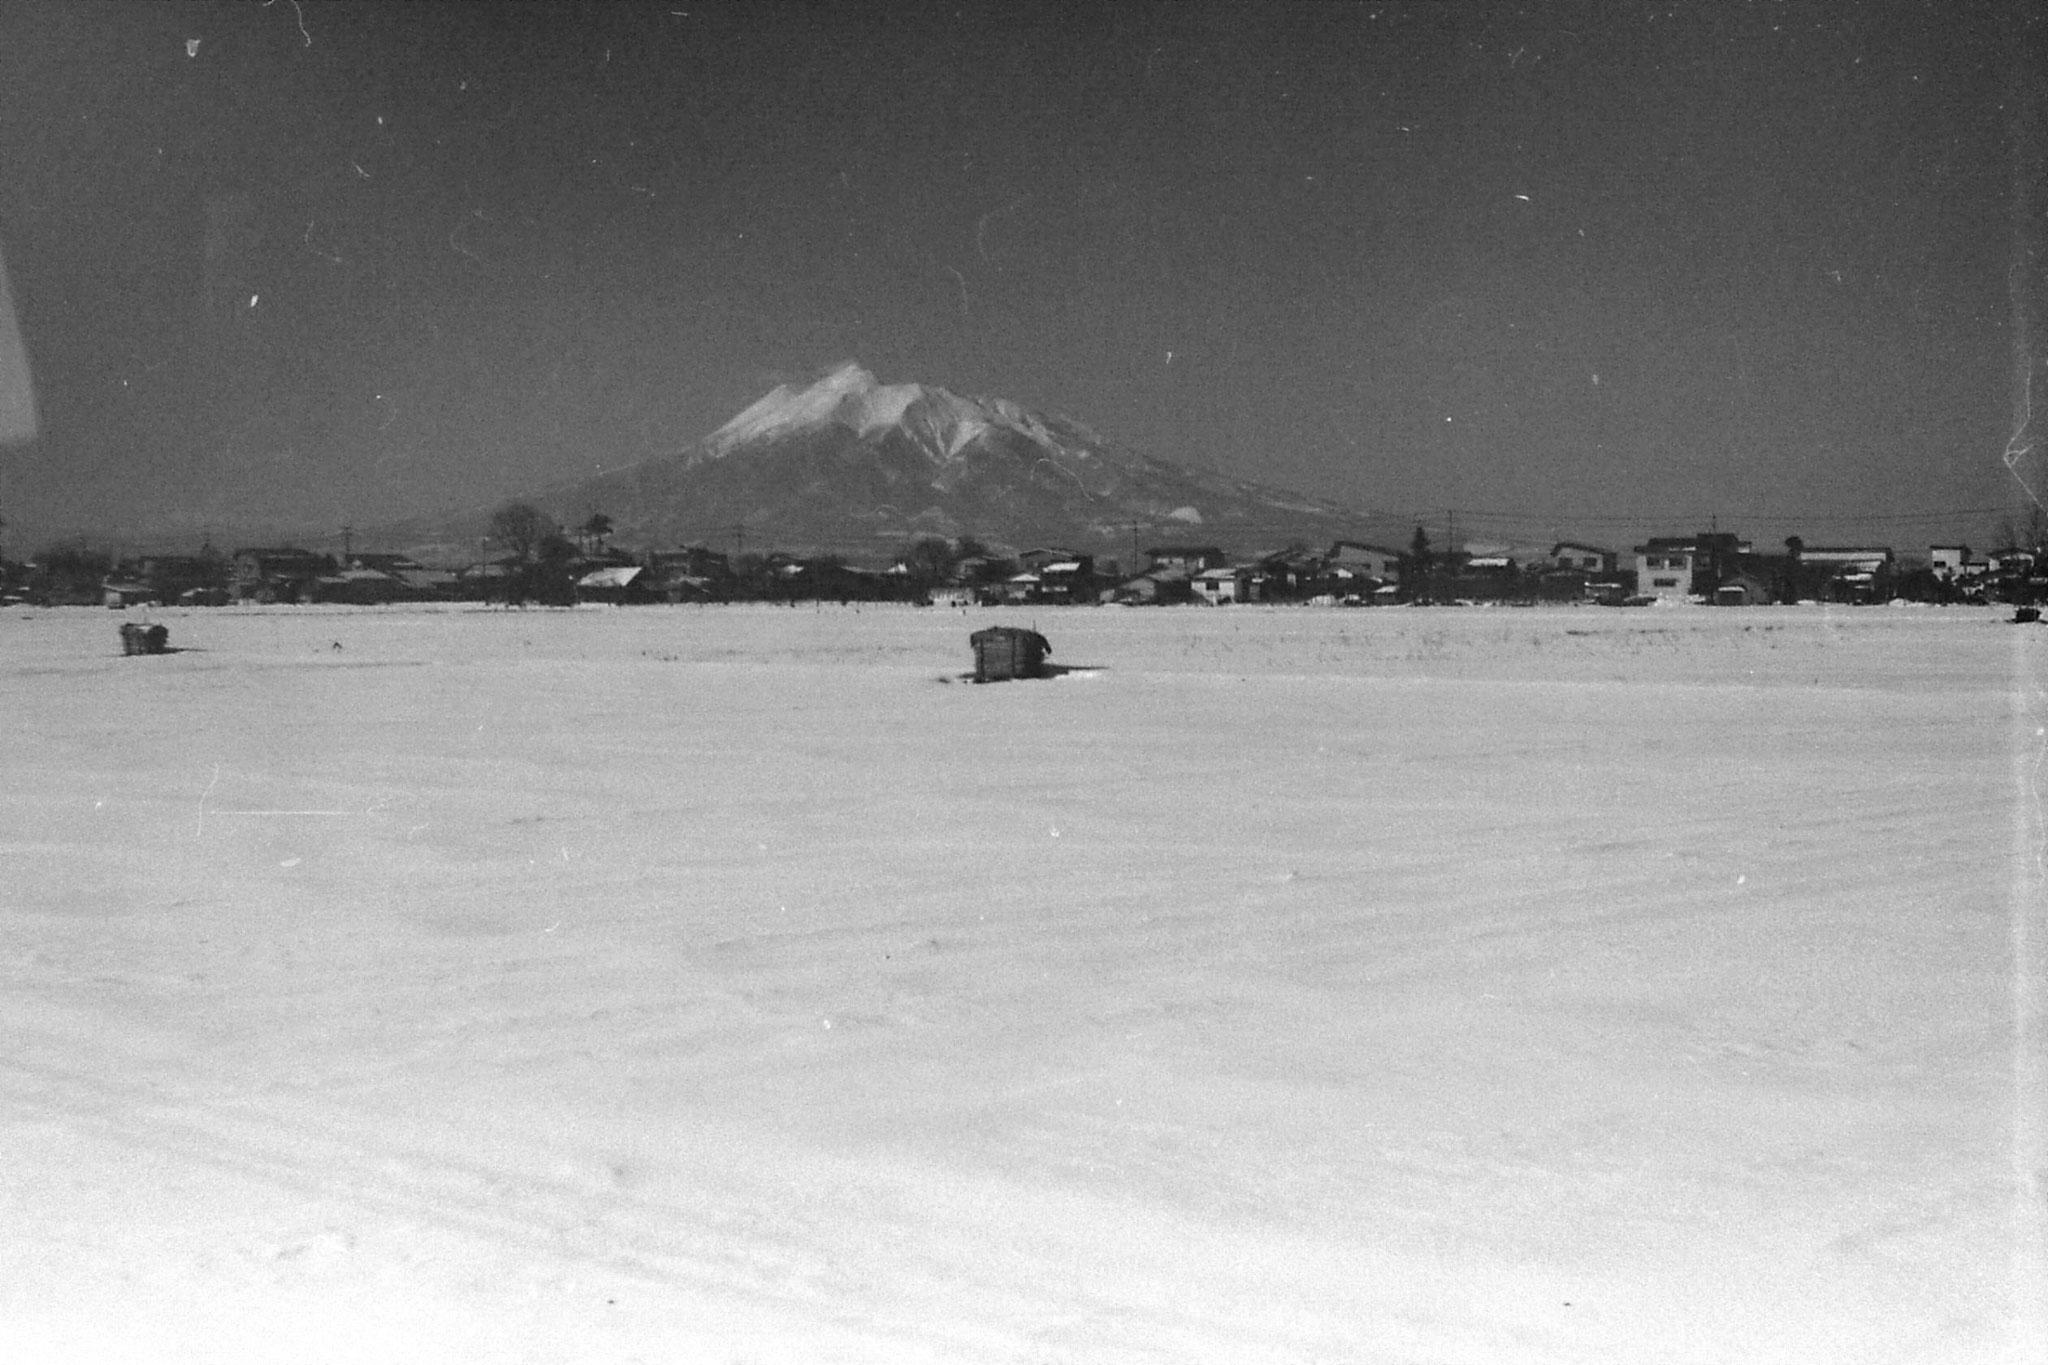 16/1/1989: 0: mountain west of Aomori nr Hirosaki at 10.25 am